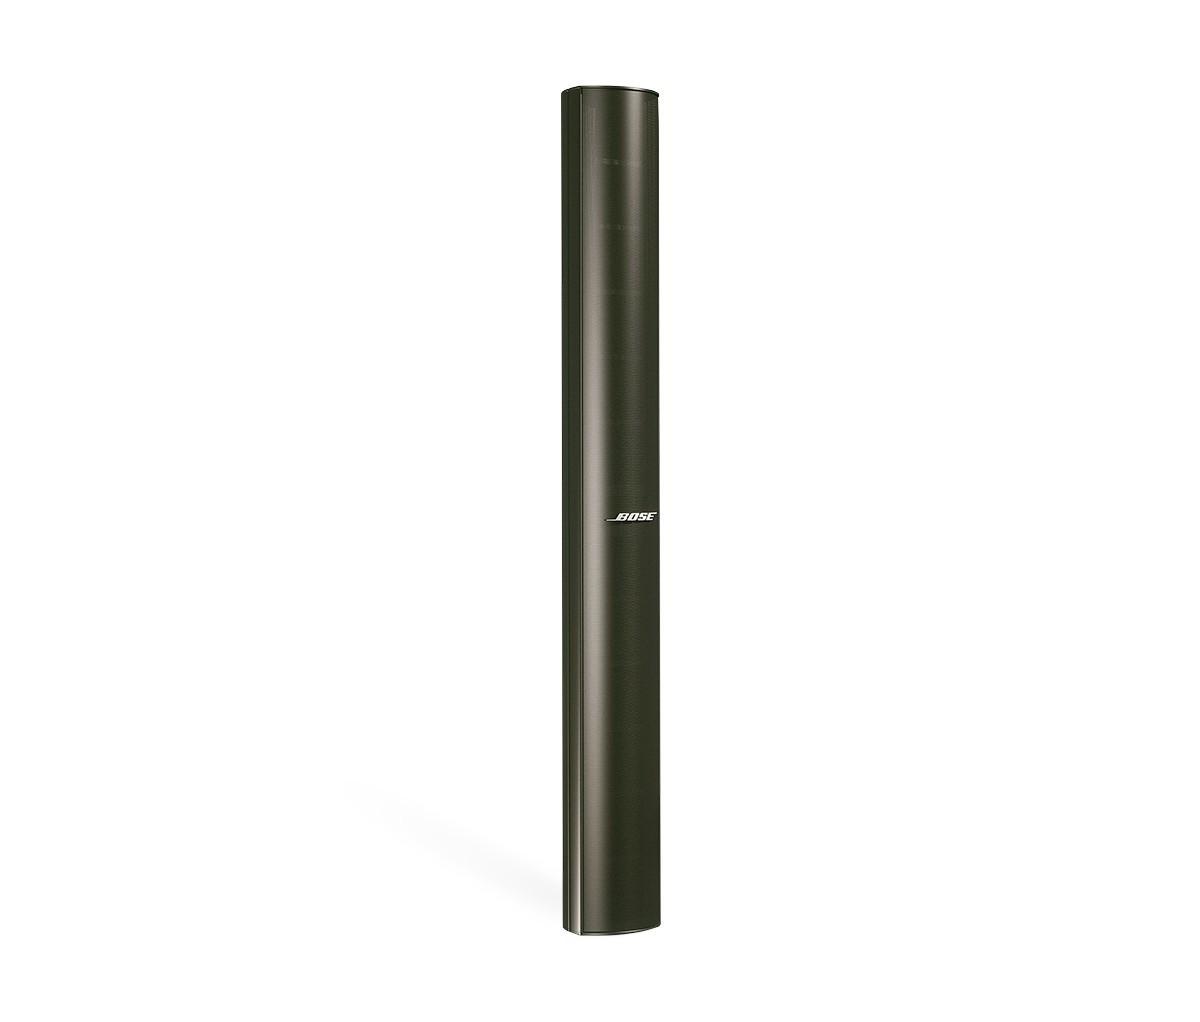 Bose Panaray® MA12 speaker (black or white)